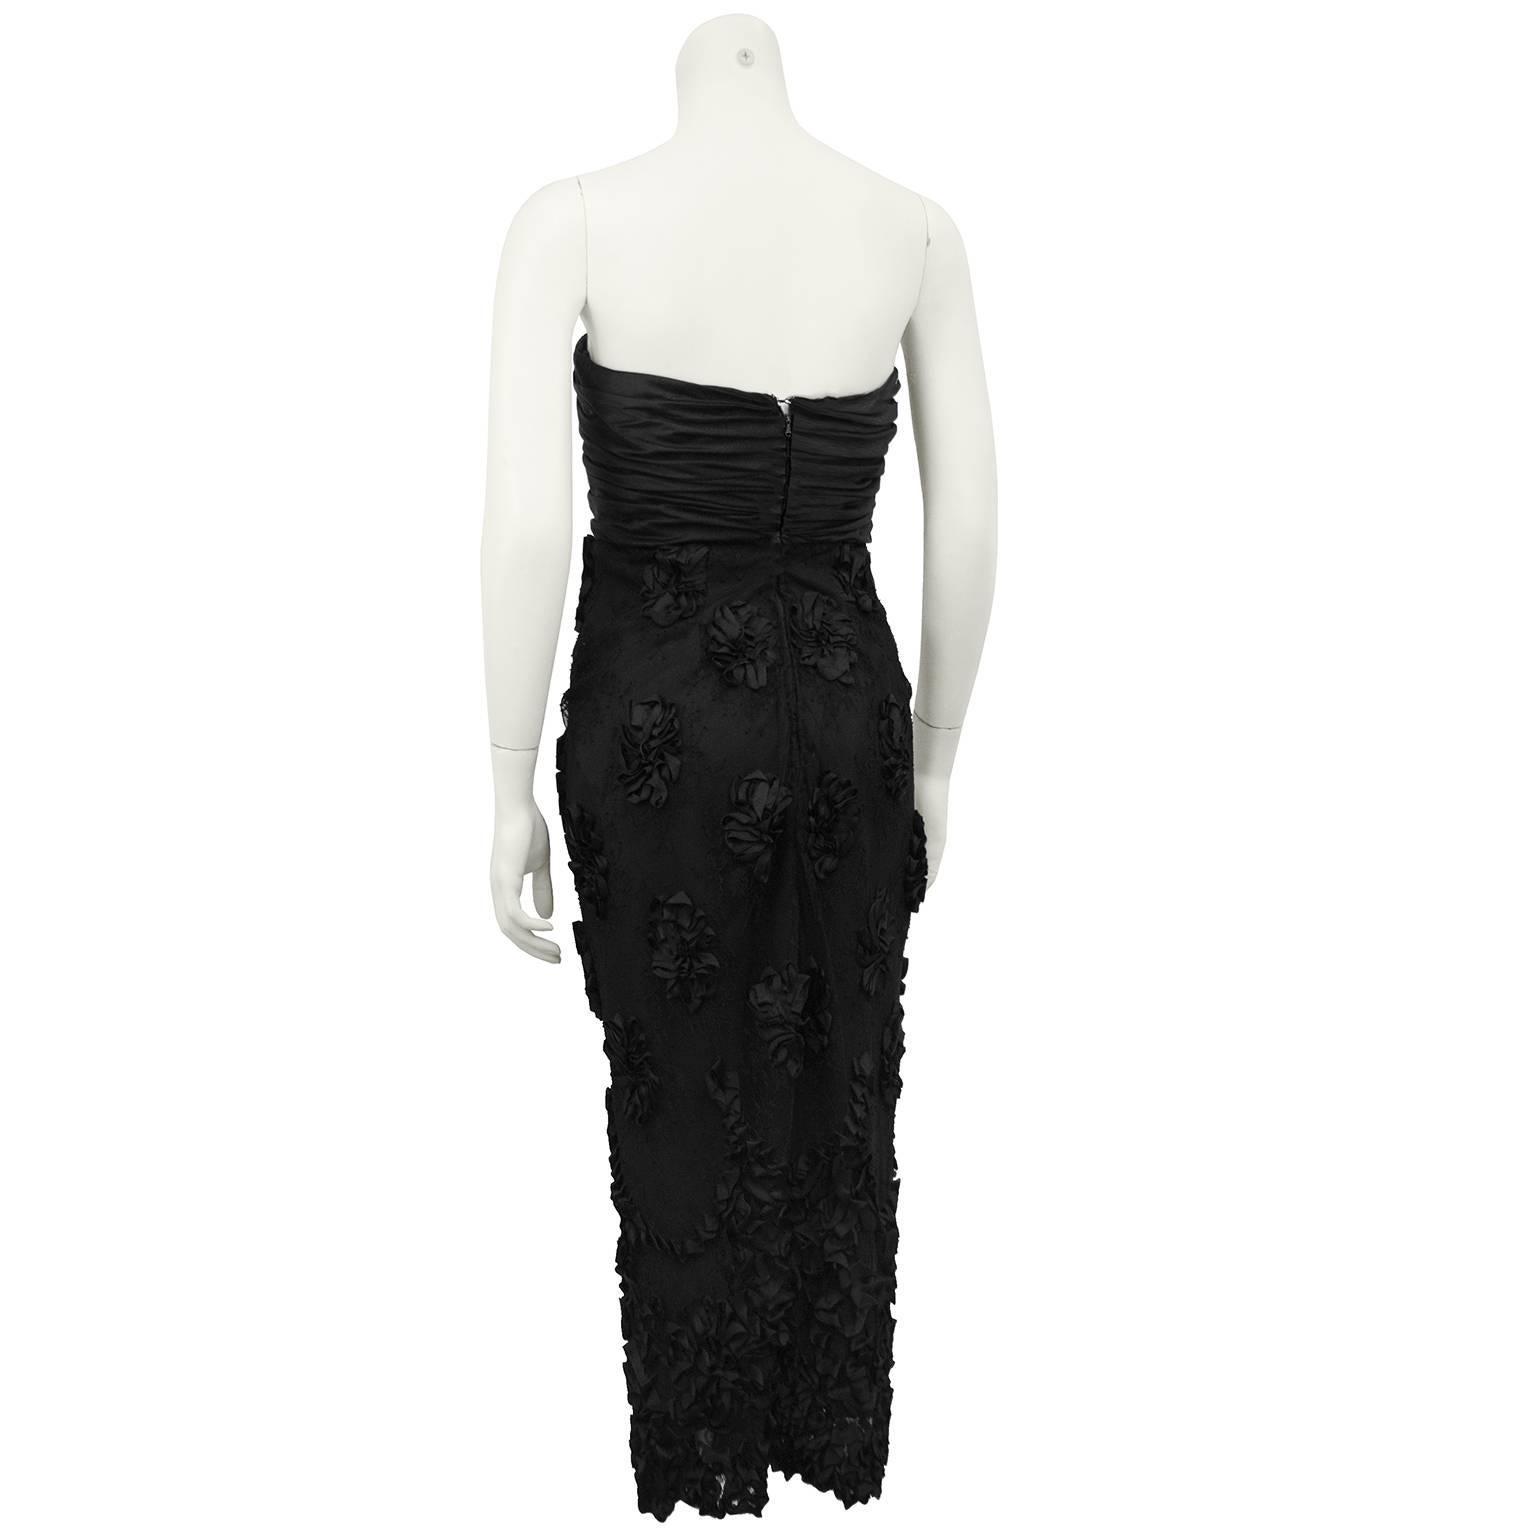 1960s Black Strapless Cocktail Dress